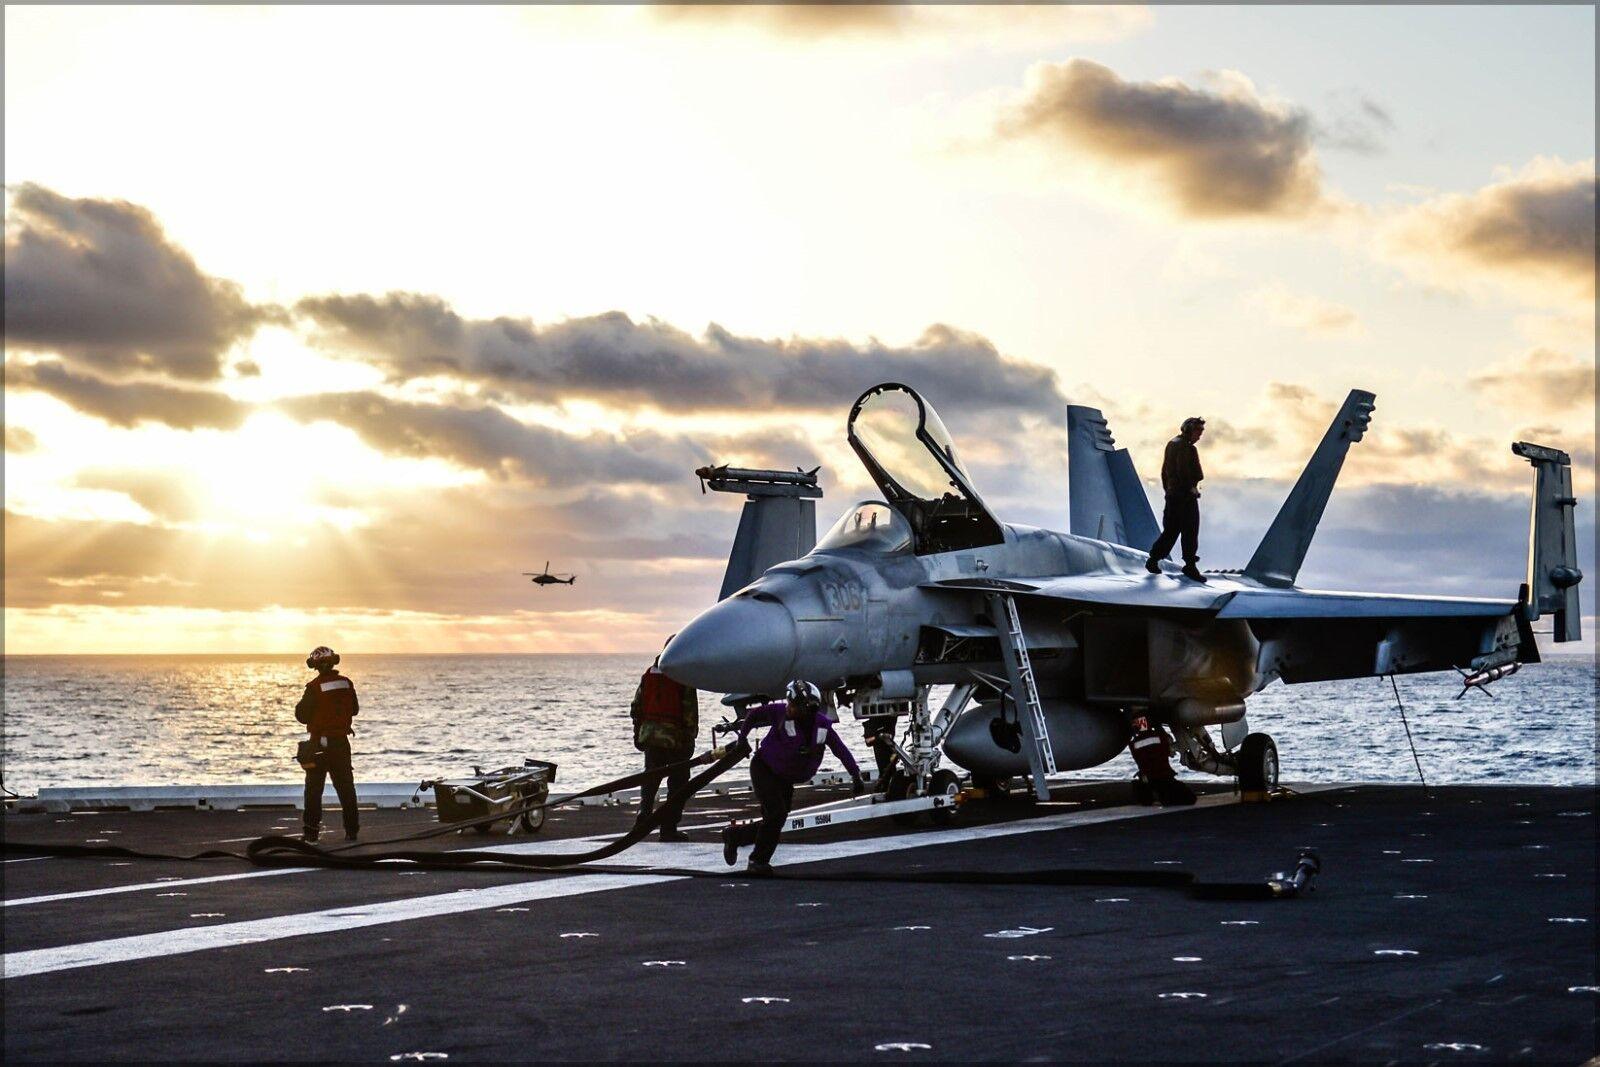 Poster, Molte Misure; Fa-18e F-18 Super Hornet a Bordo Bordo Bordo Uss Ronald Reagan (Cvn-76 93a2de